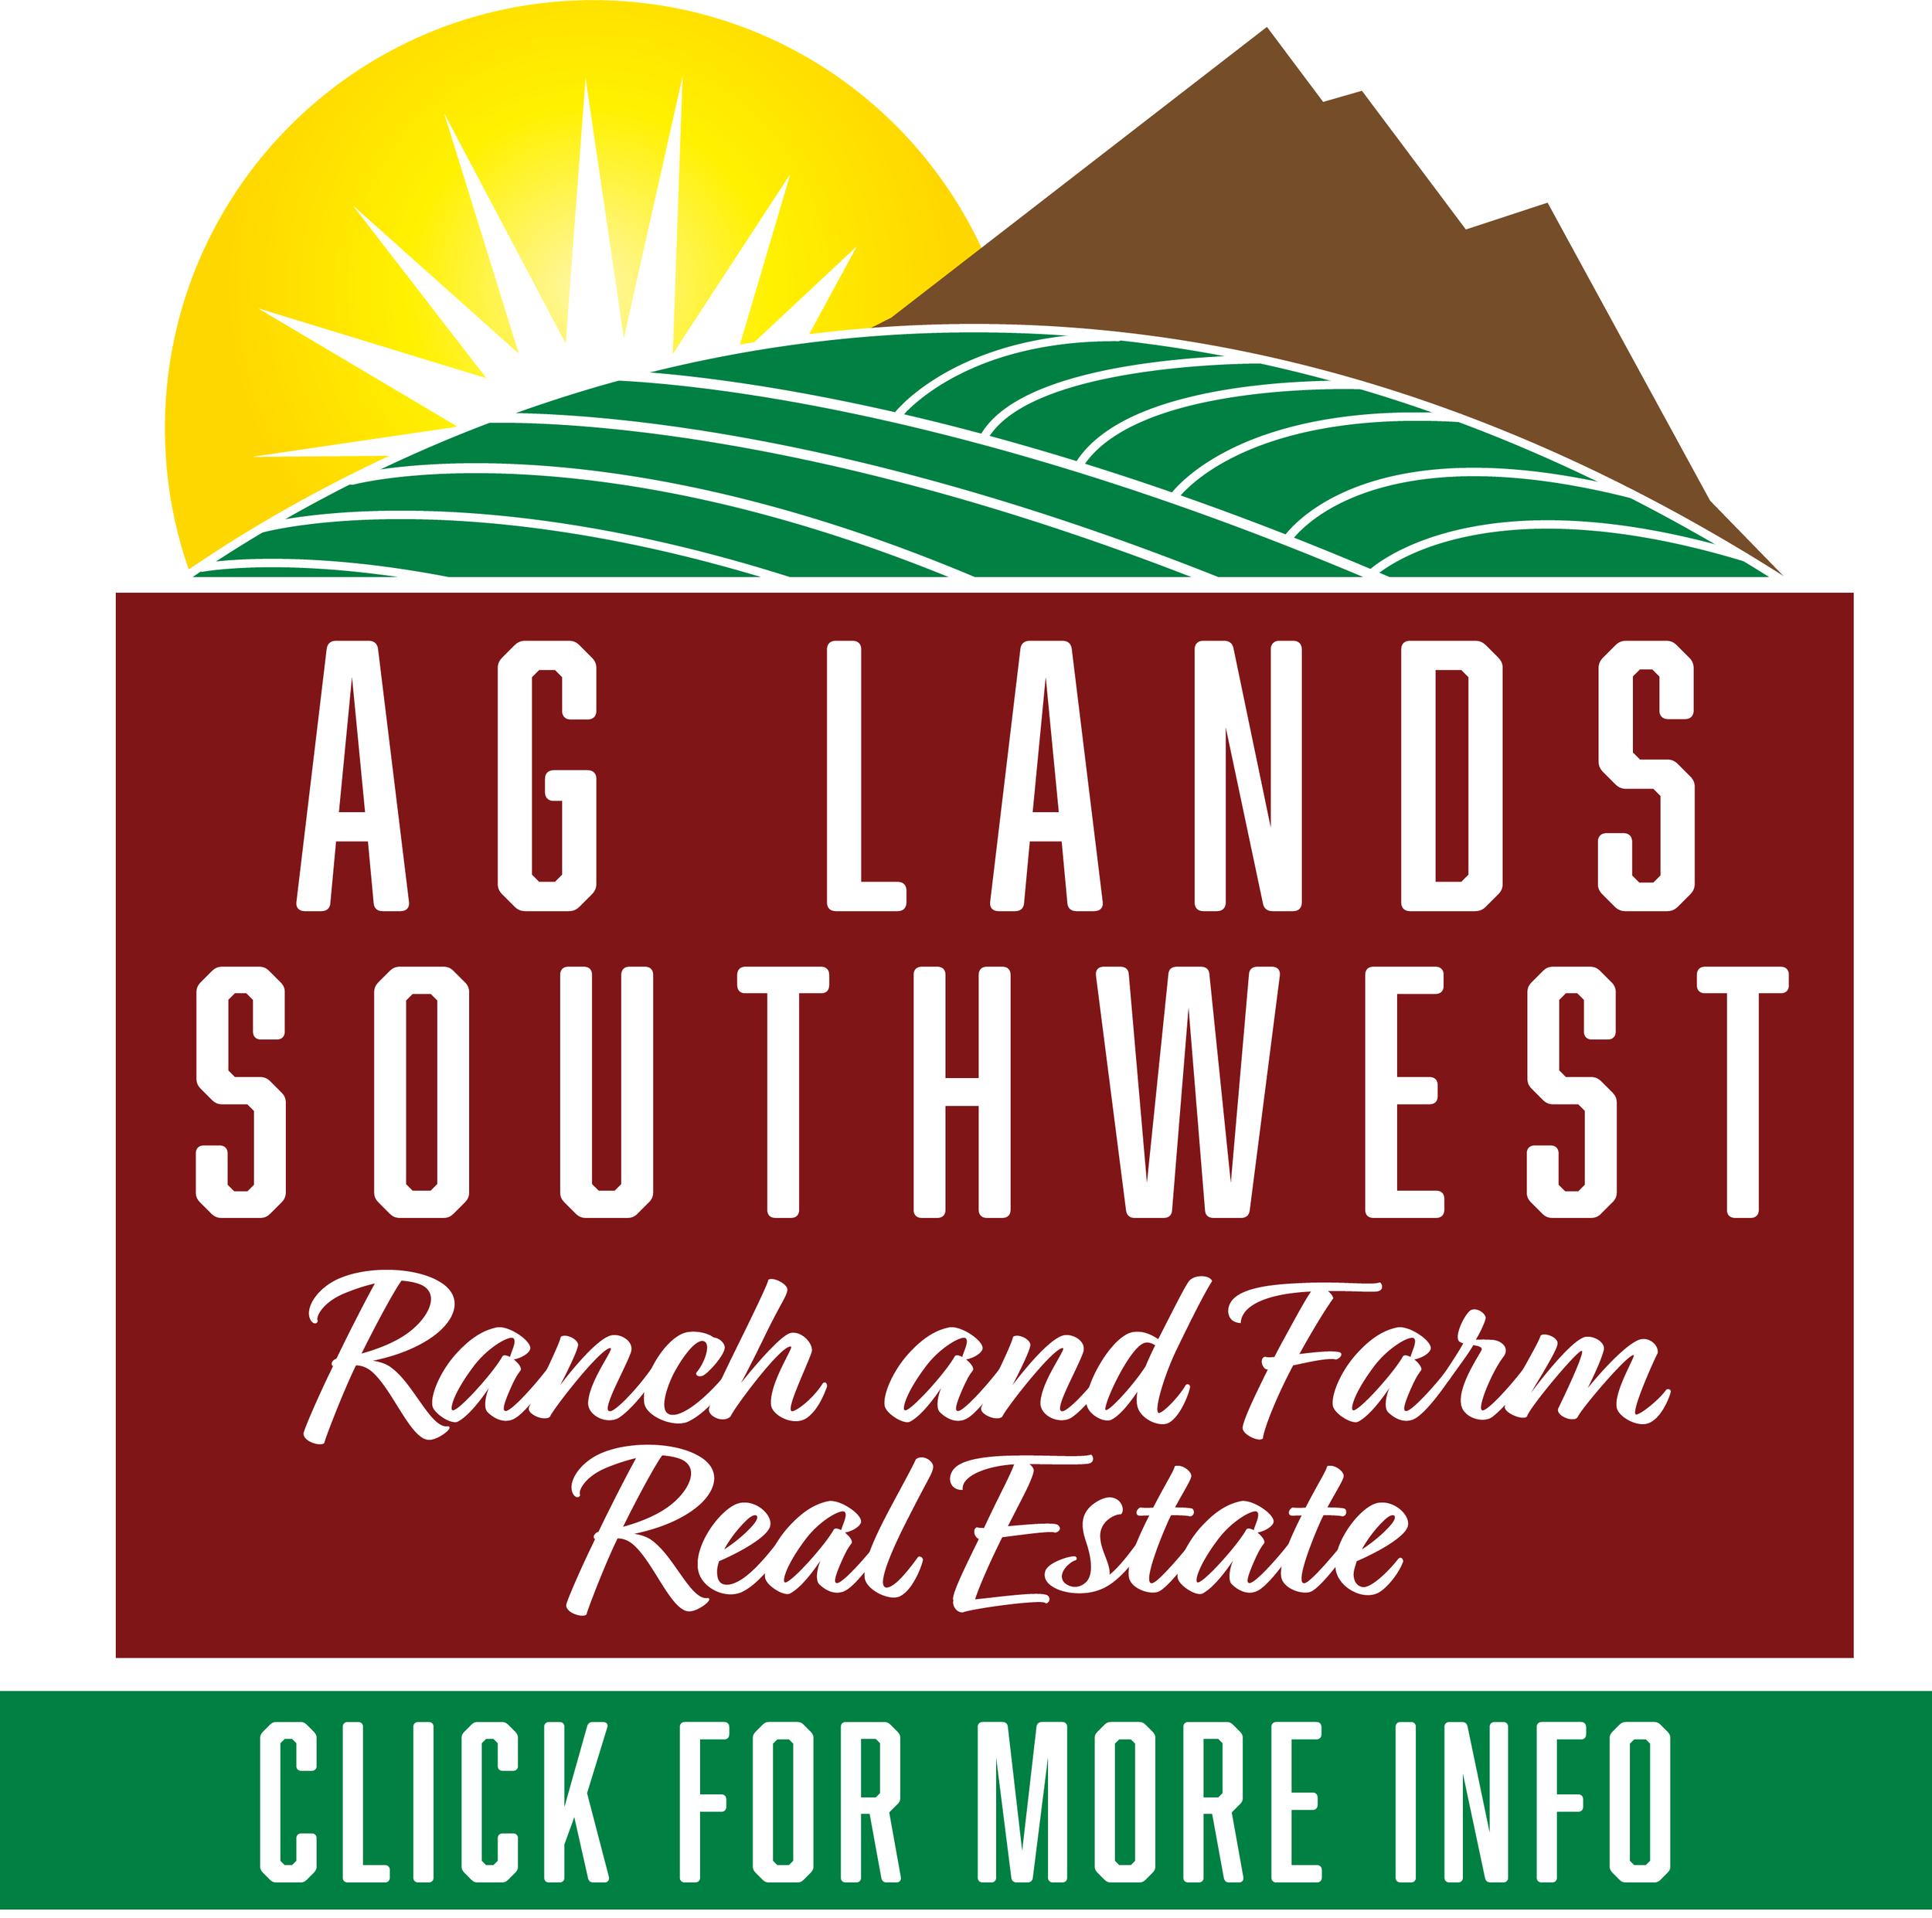 Ag Lands Southwest: Tamra Kelly 928-830-9127